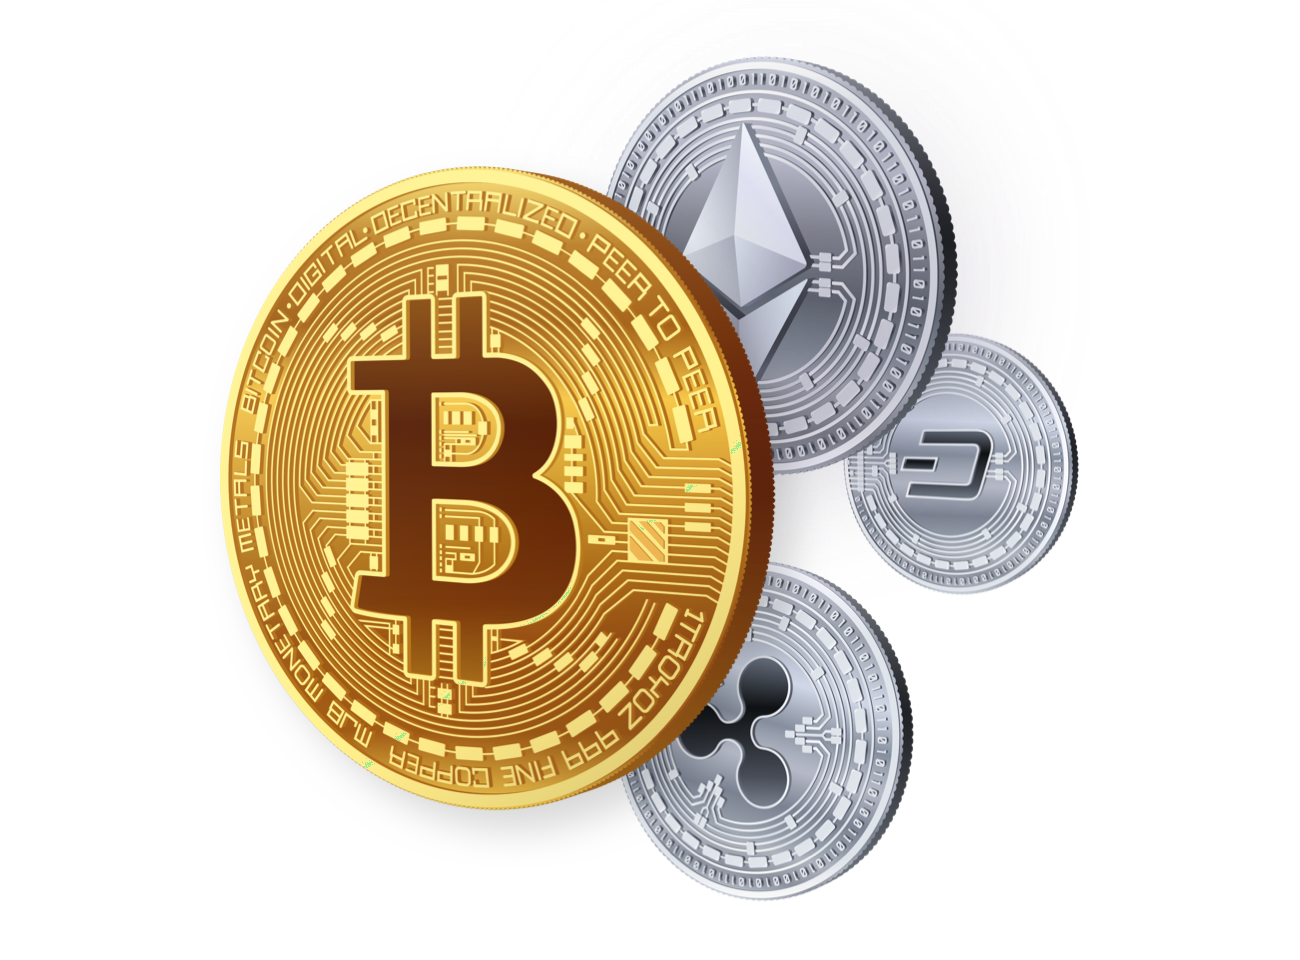 cripto cfd analiză de tranzacționare motiv care investește criptomoneda